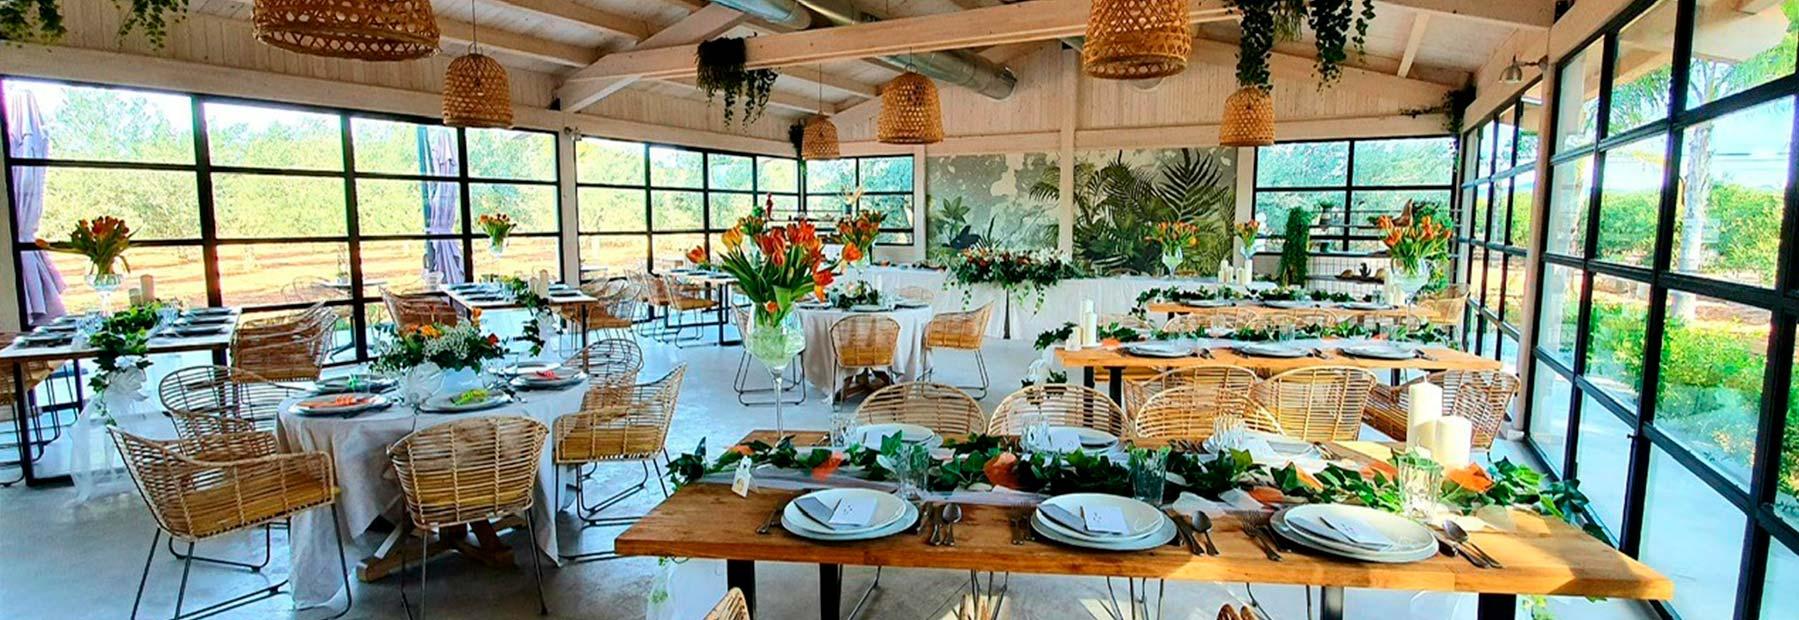 Restaurant Octavia à Valence.